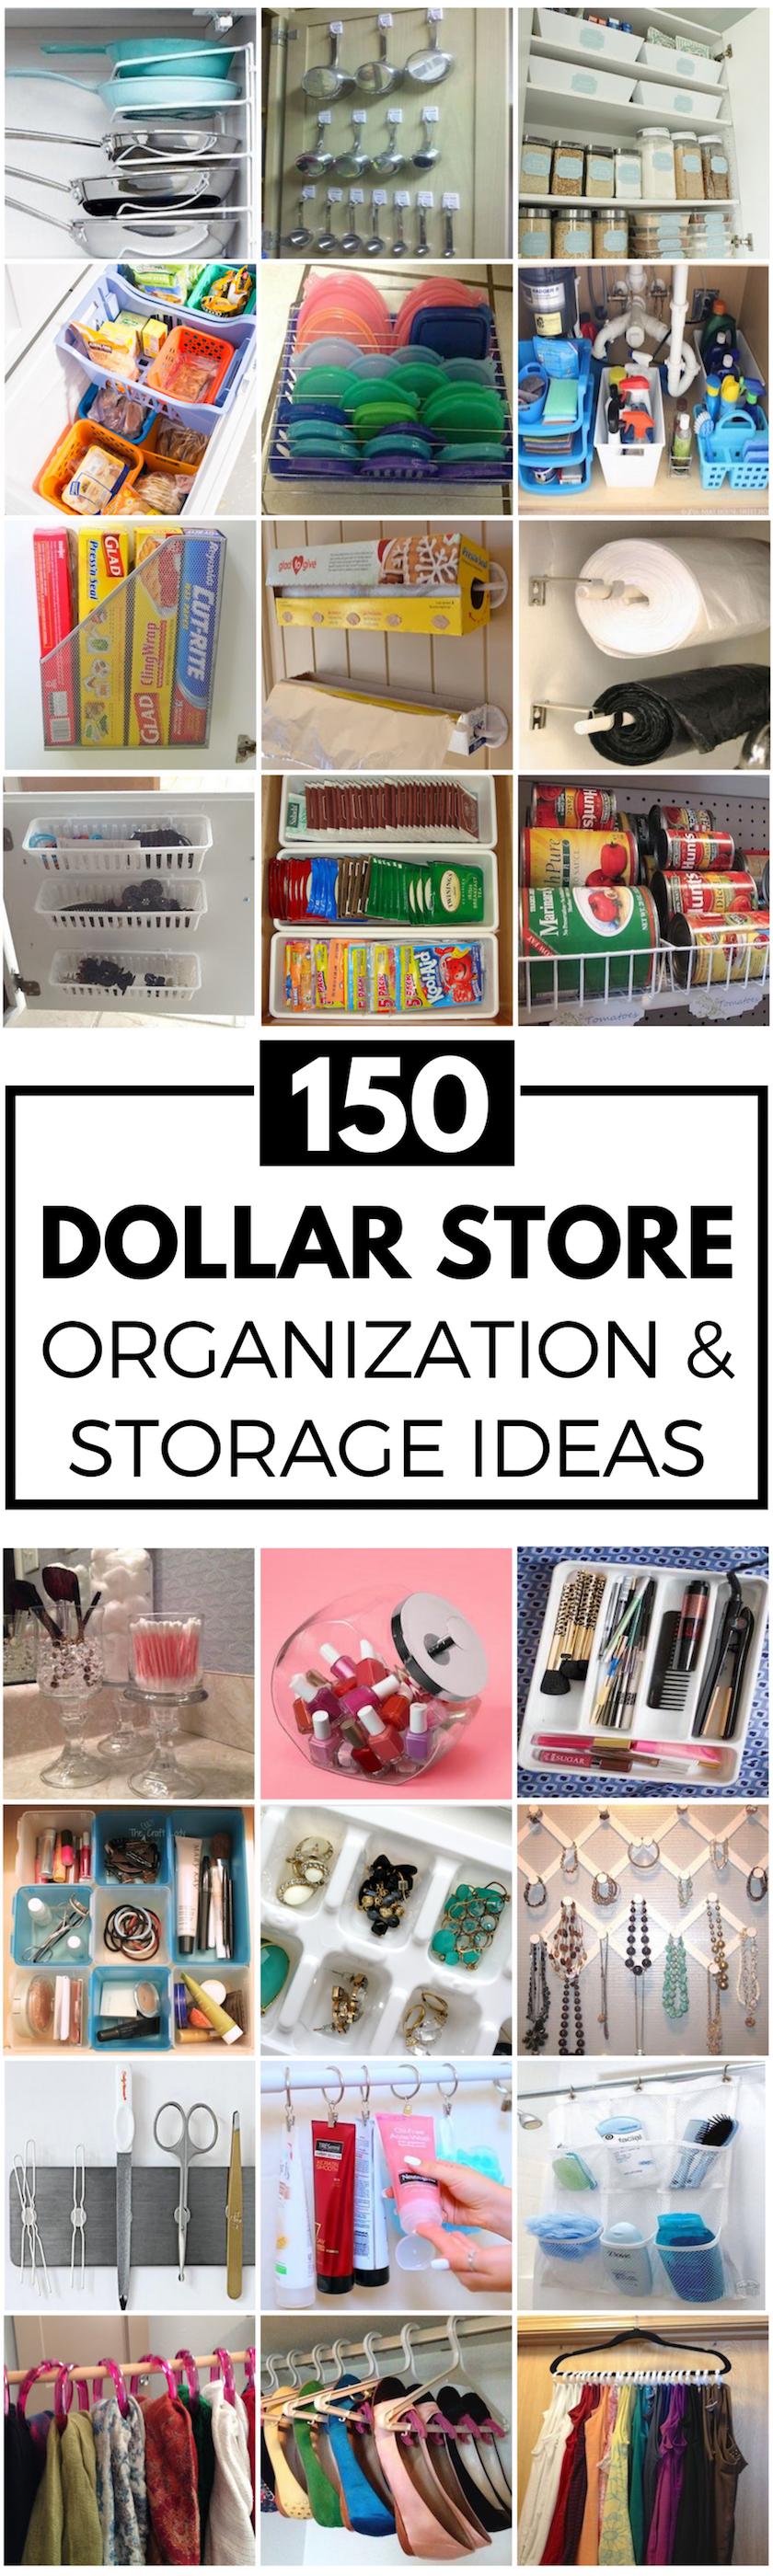 150 diy dollar store organization and storage ideas dollar store 150 diy dollar store organization and storage ideas solutioingenieria Images